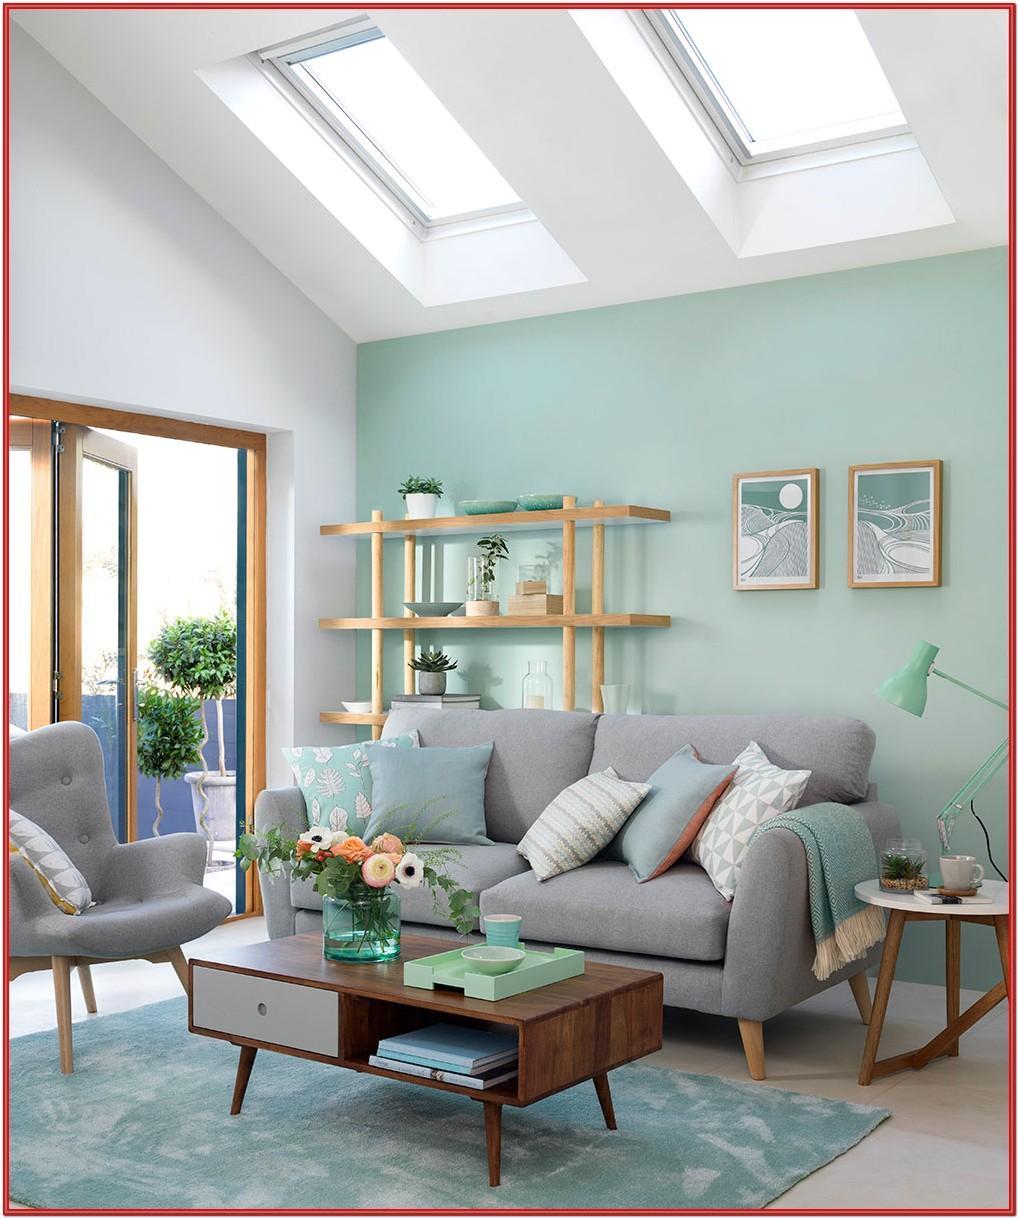 Living Room Directional Lighting Ideas